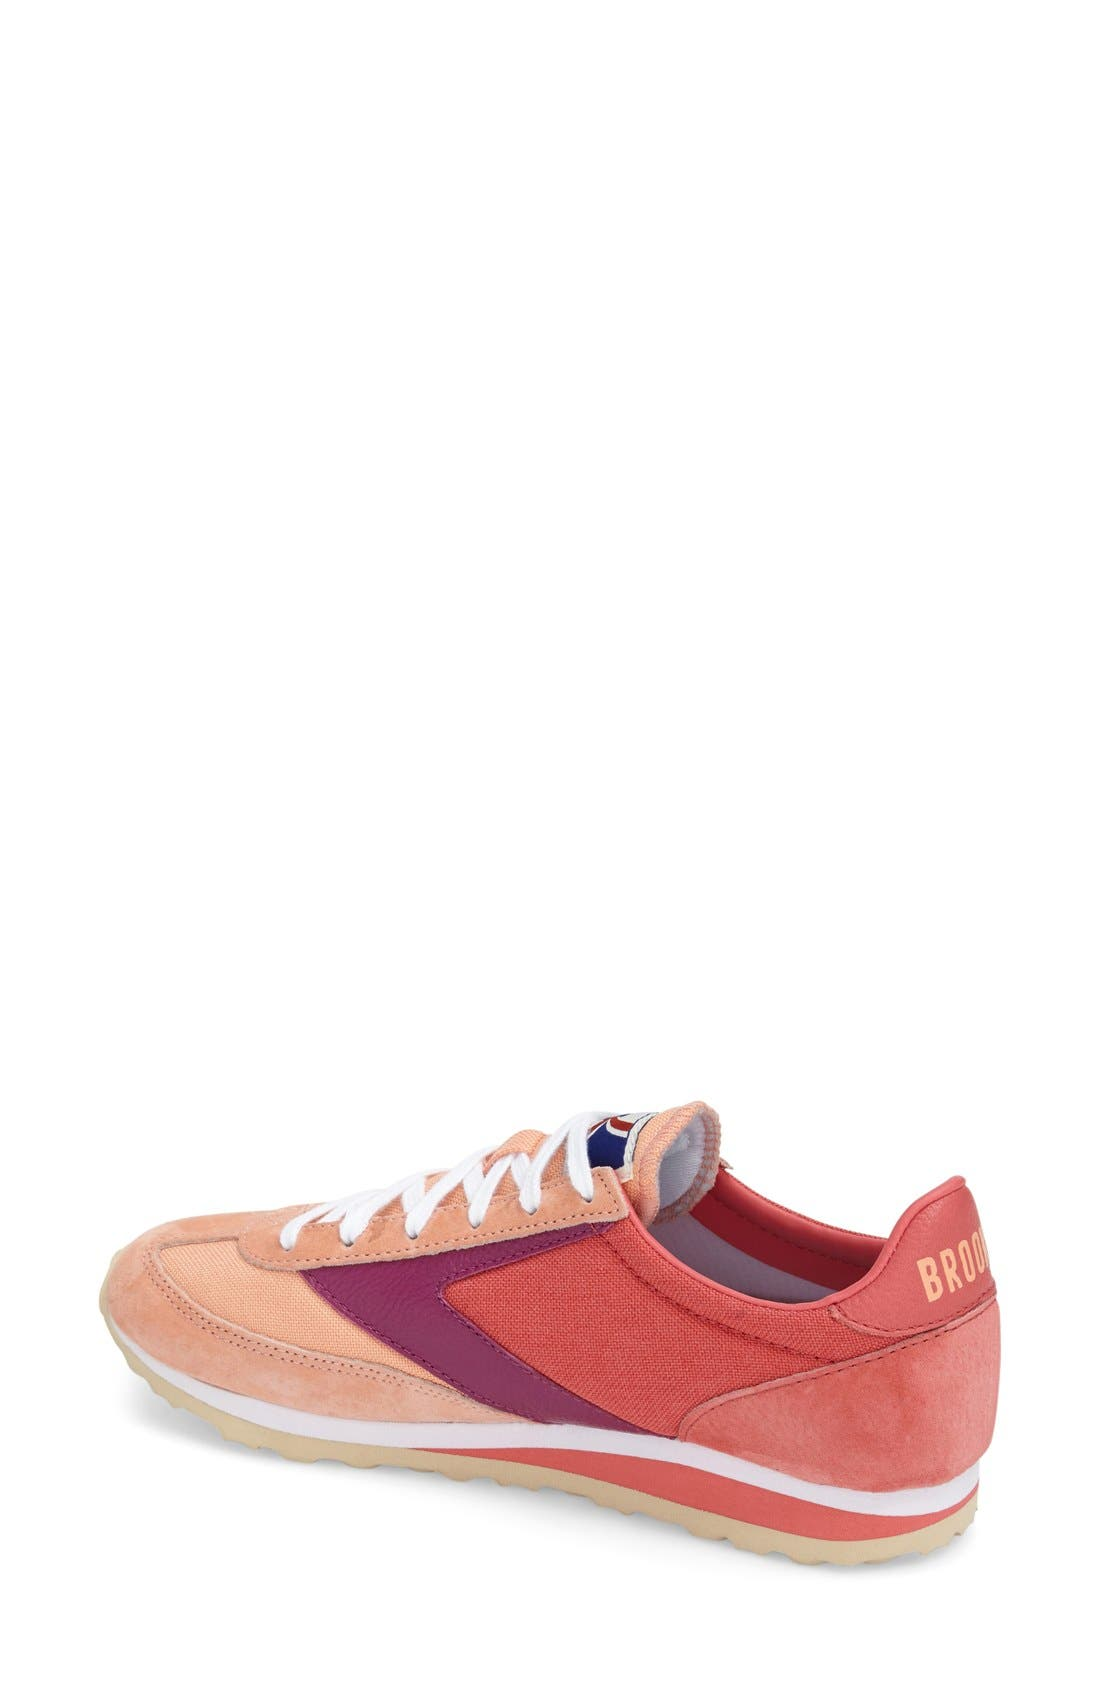 'Vanguard' Sneaker,                             Alternate thumbnail 139, color,